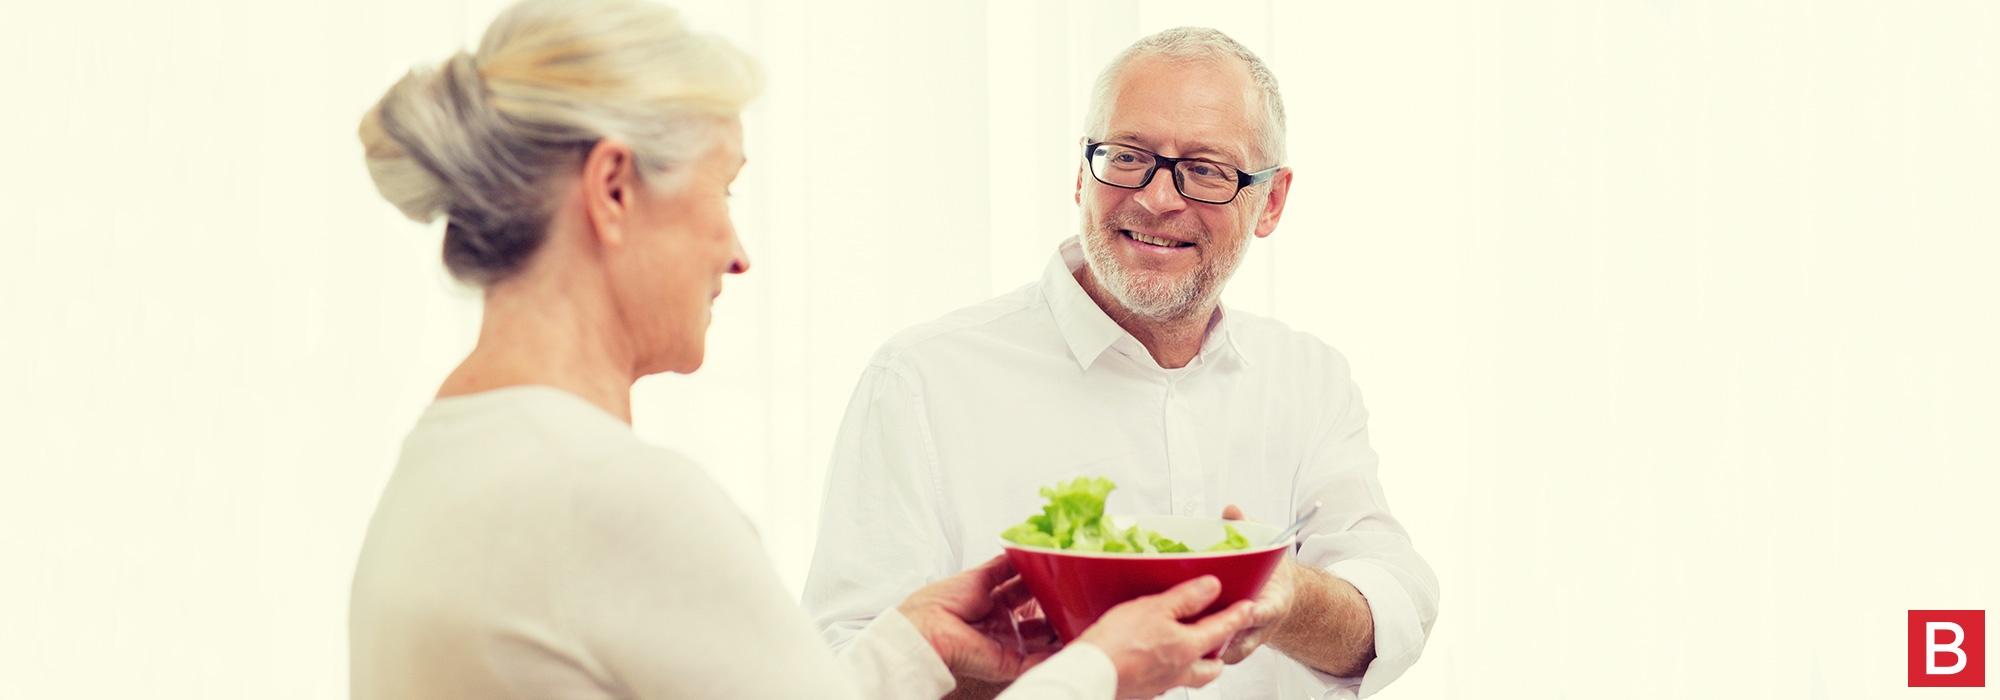 Eating-Healthy-with-Diabetes-2000x700.jpg